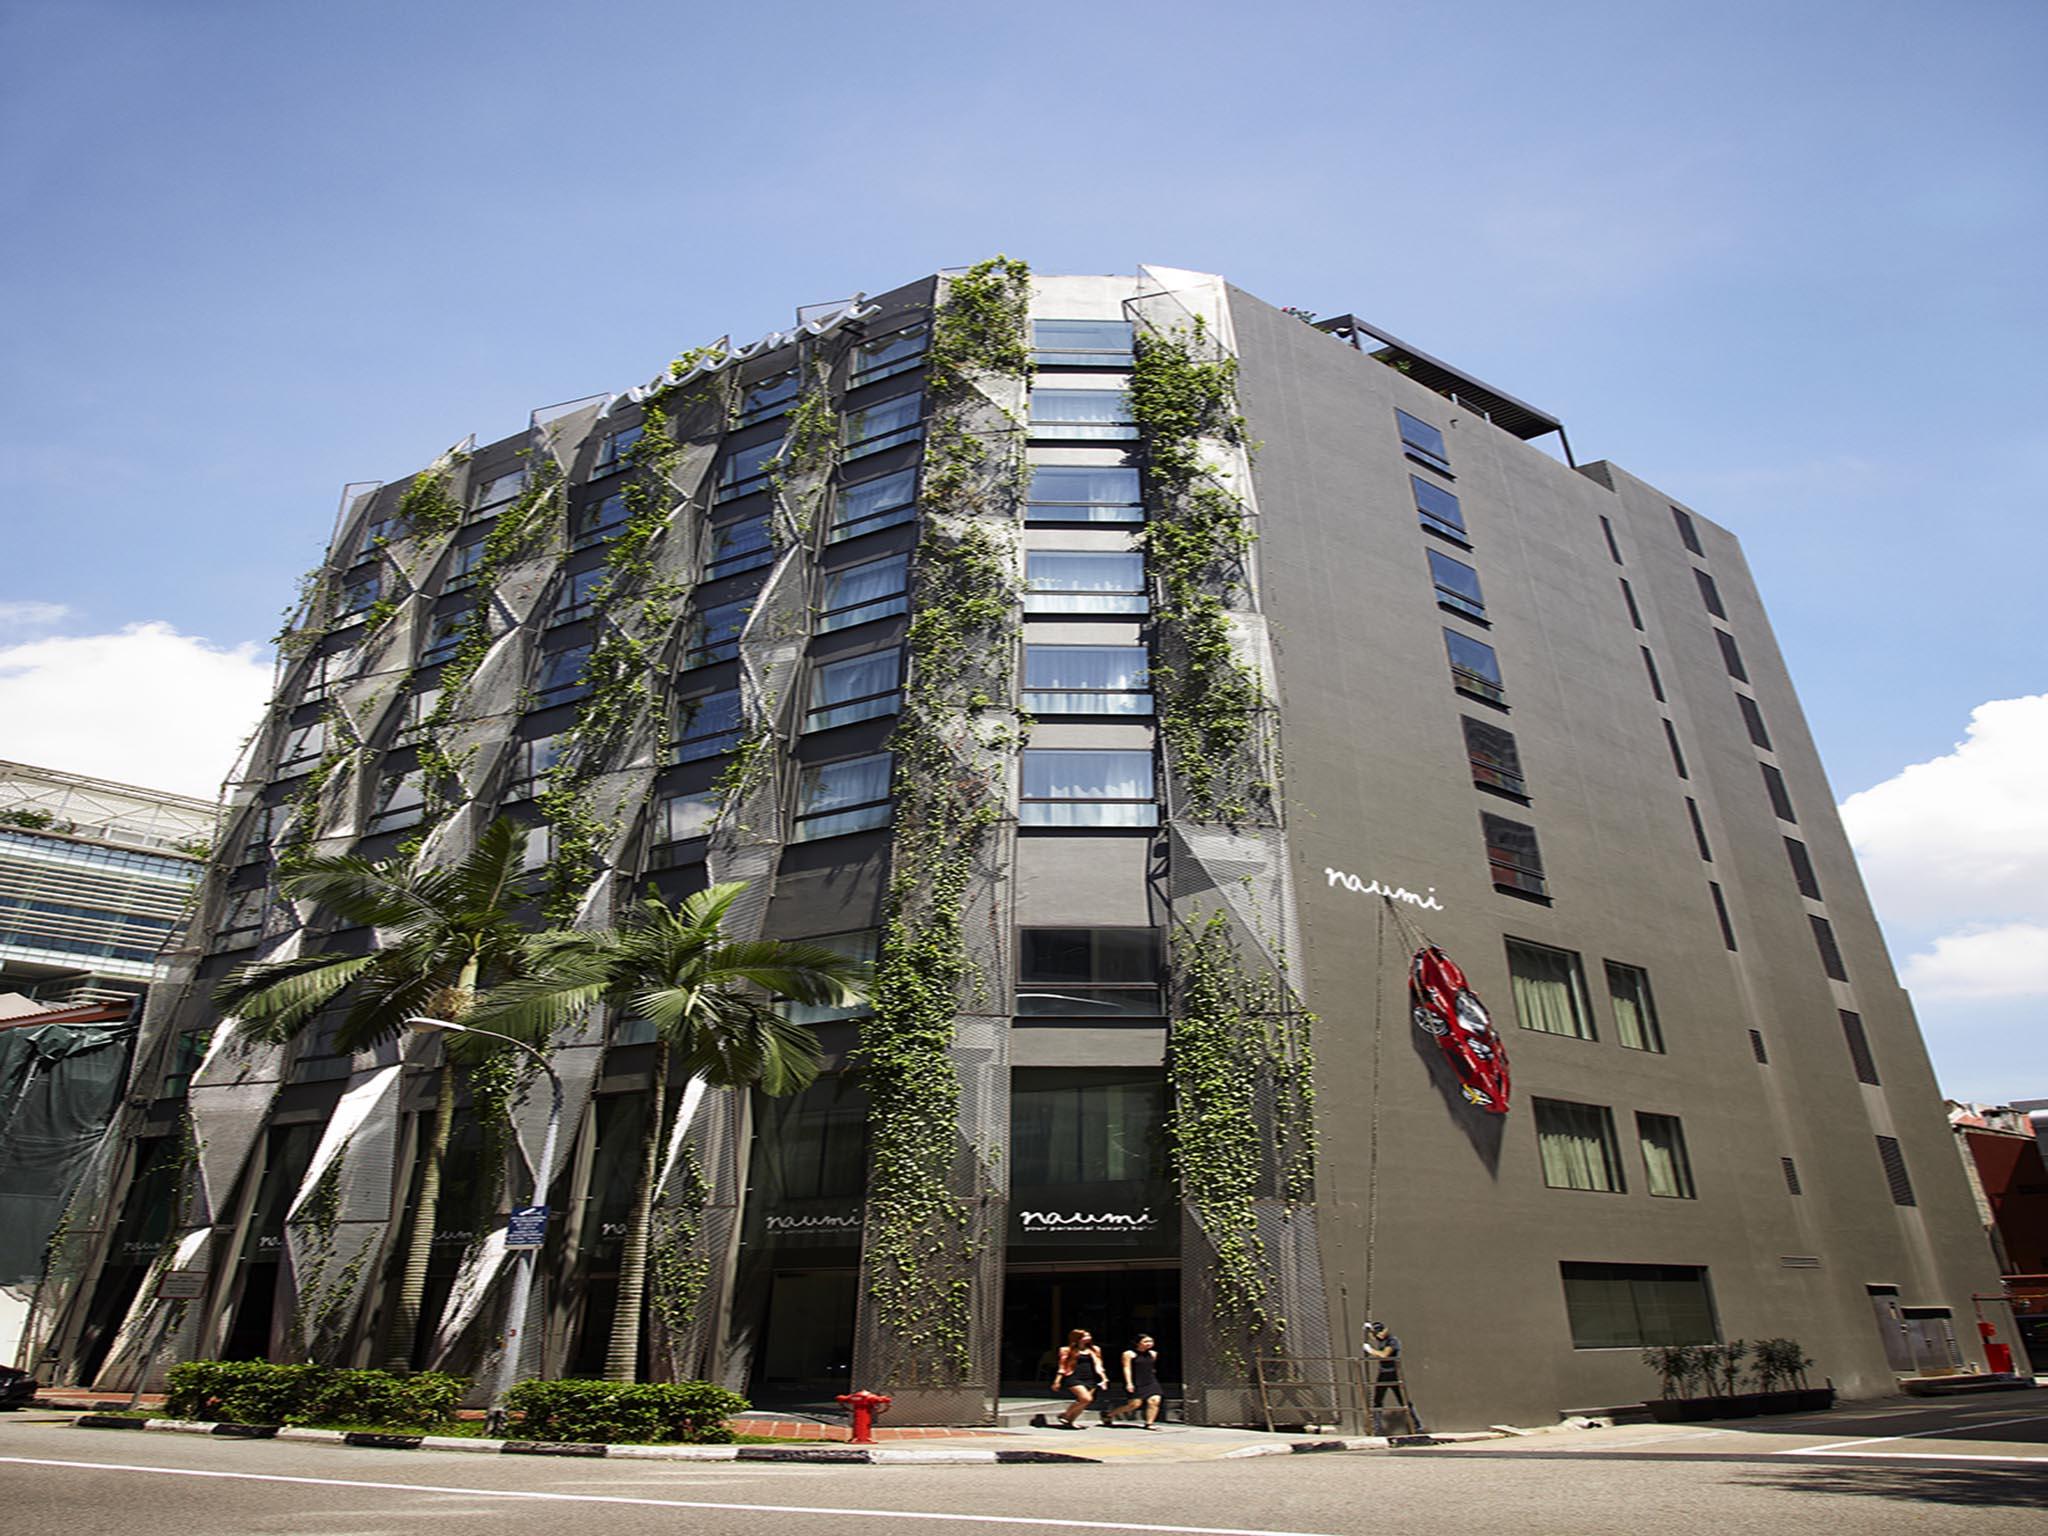 ferrara-contemporary-bathroom-singapore-project-reference-naumi-hotel-crestial